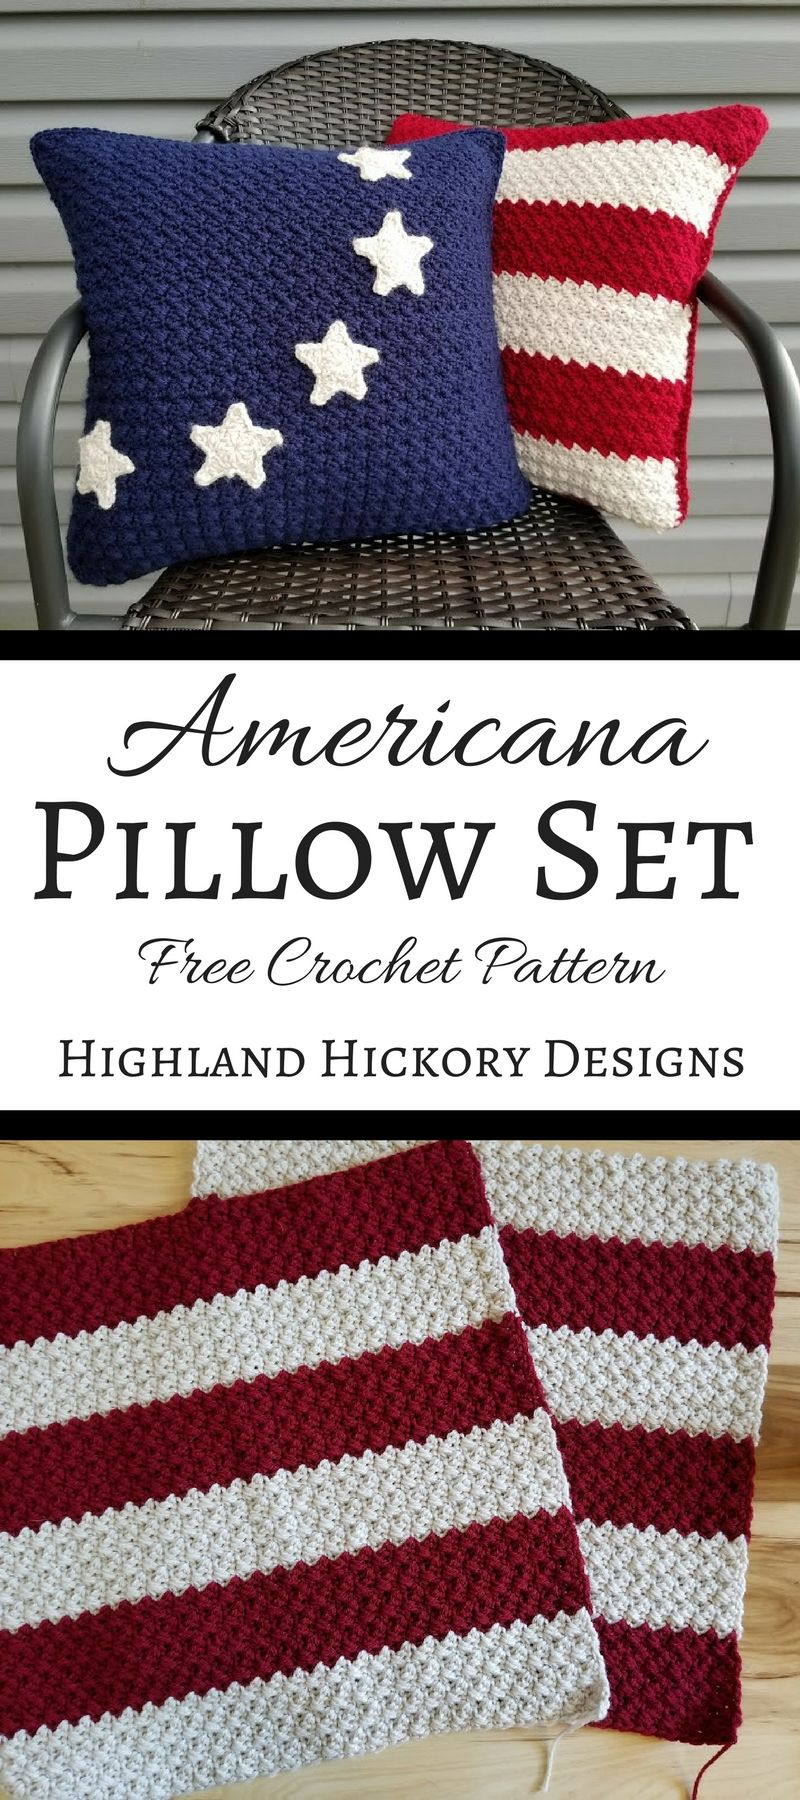 Americana Pillows | Tapetes, Ganchillo y Artesanía